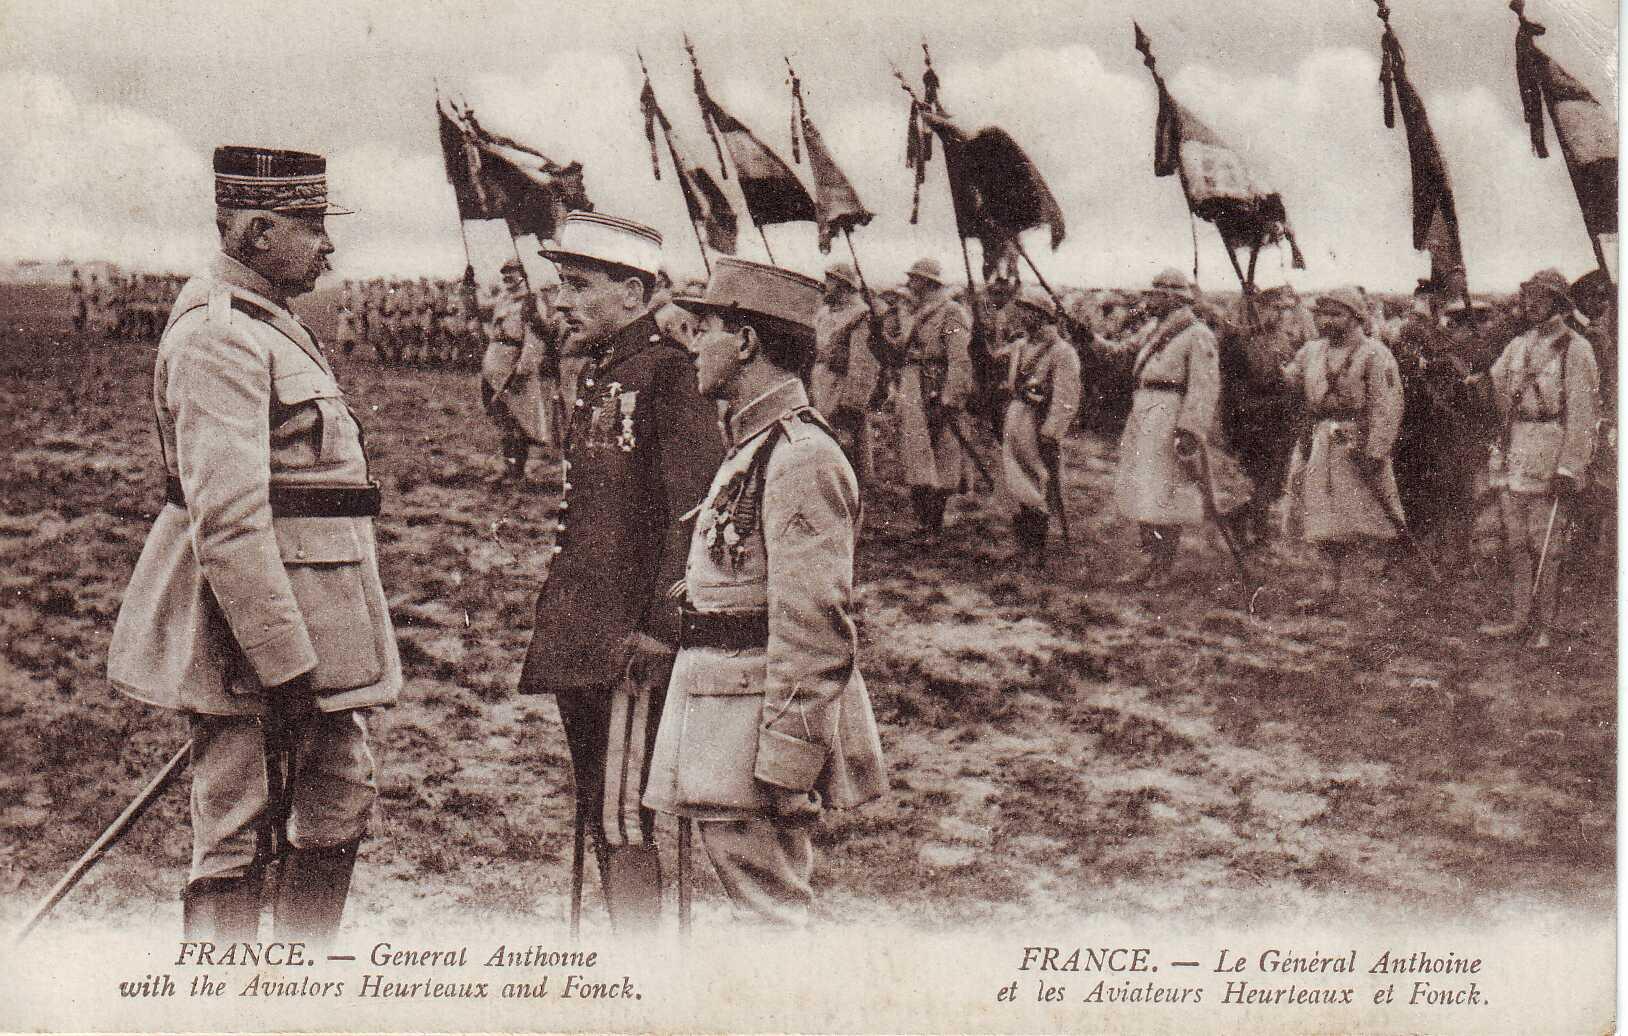 General-Anthoine-Aviateurs-Heurteaux-Fonck.jpg